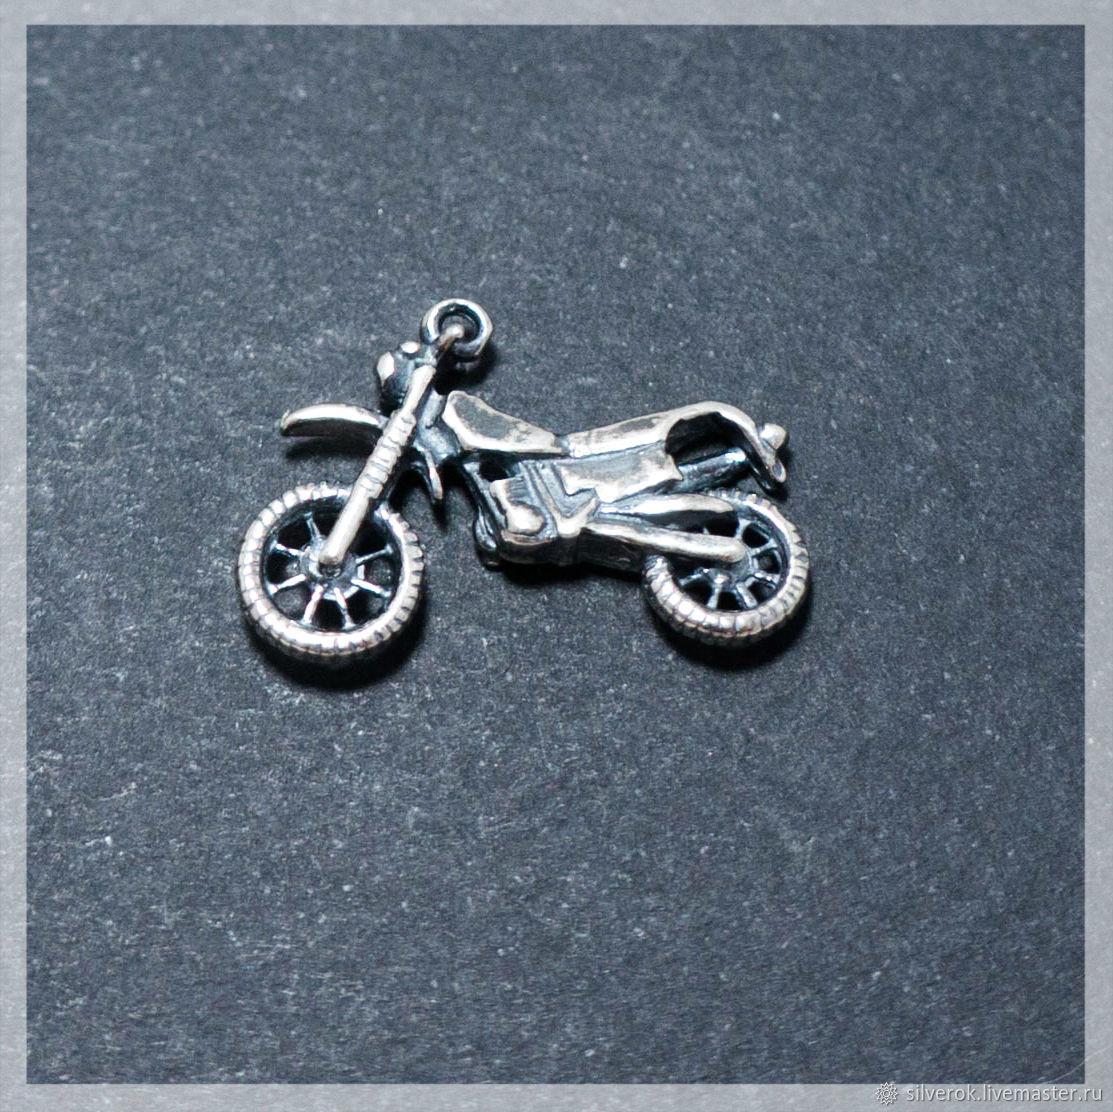 Подвес Мотоцикл №2 серебро 925 проба с чернением, Фурнитура, Ивано-Франковск,  Фото №1